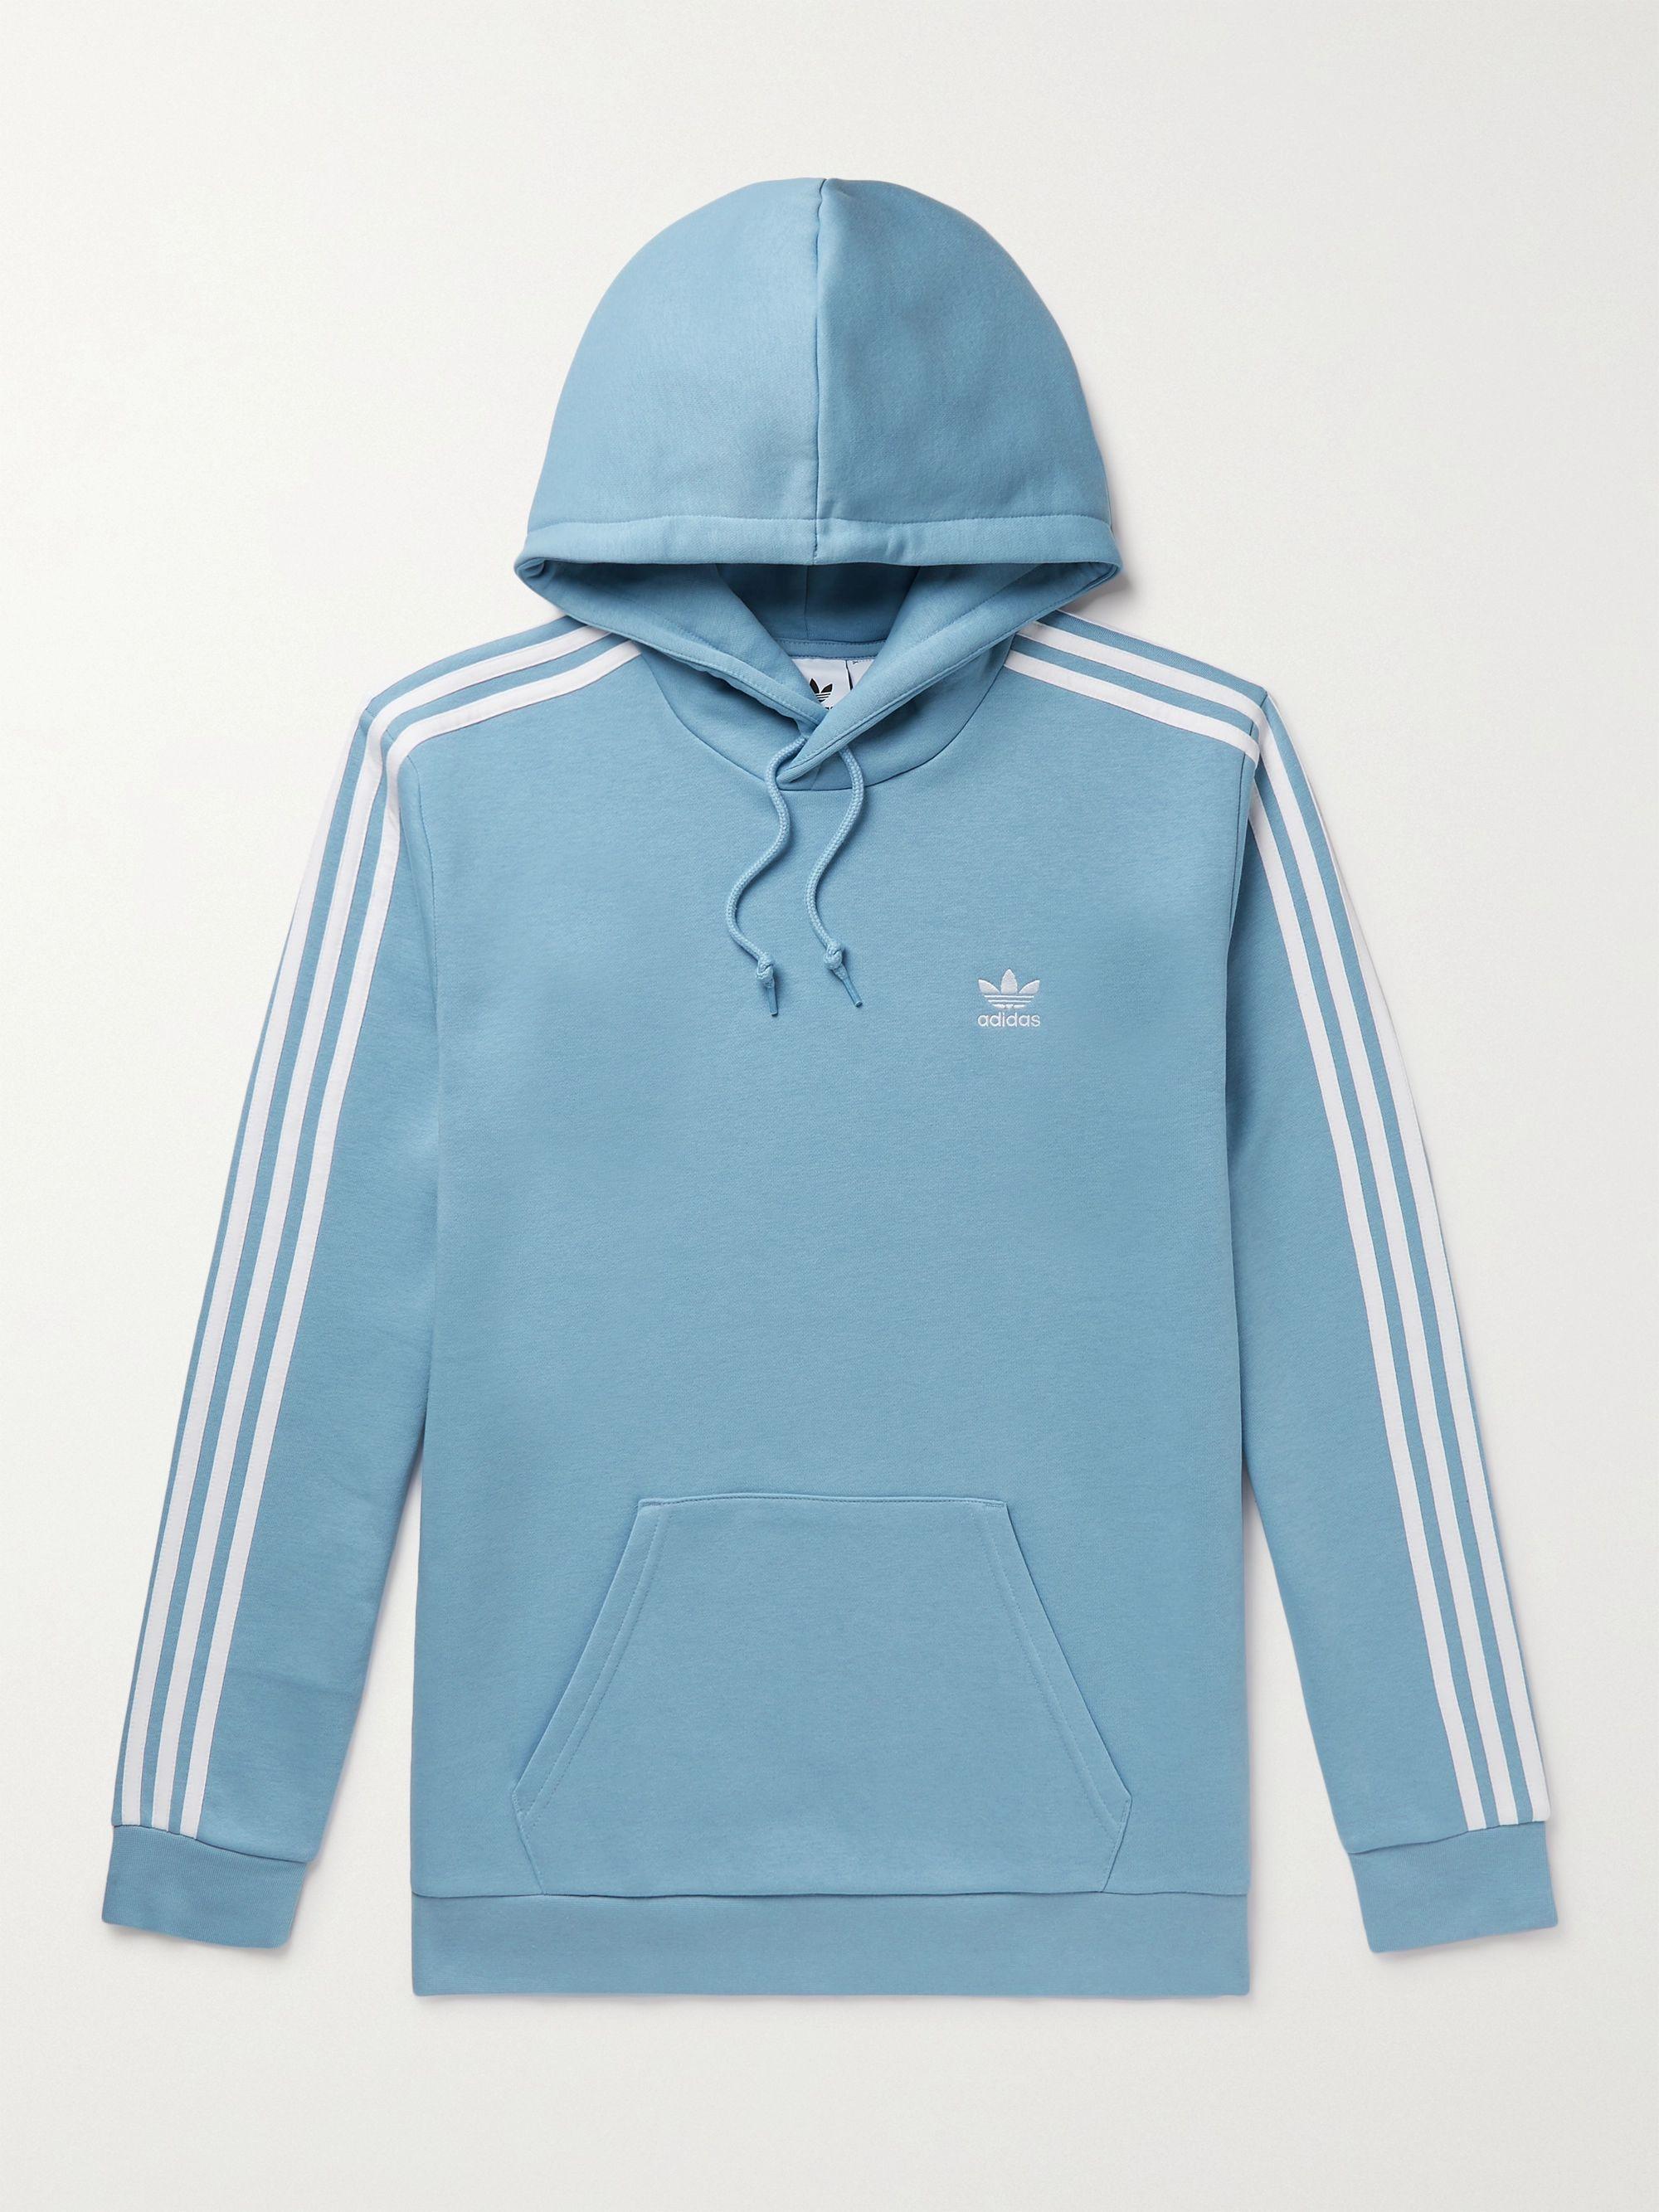 Adicolor Classics 3-Stripes Cotton-Blend Jersey Hoodie